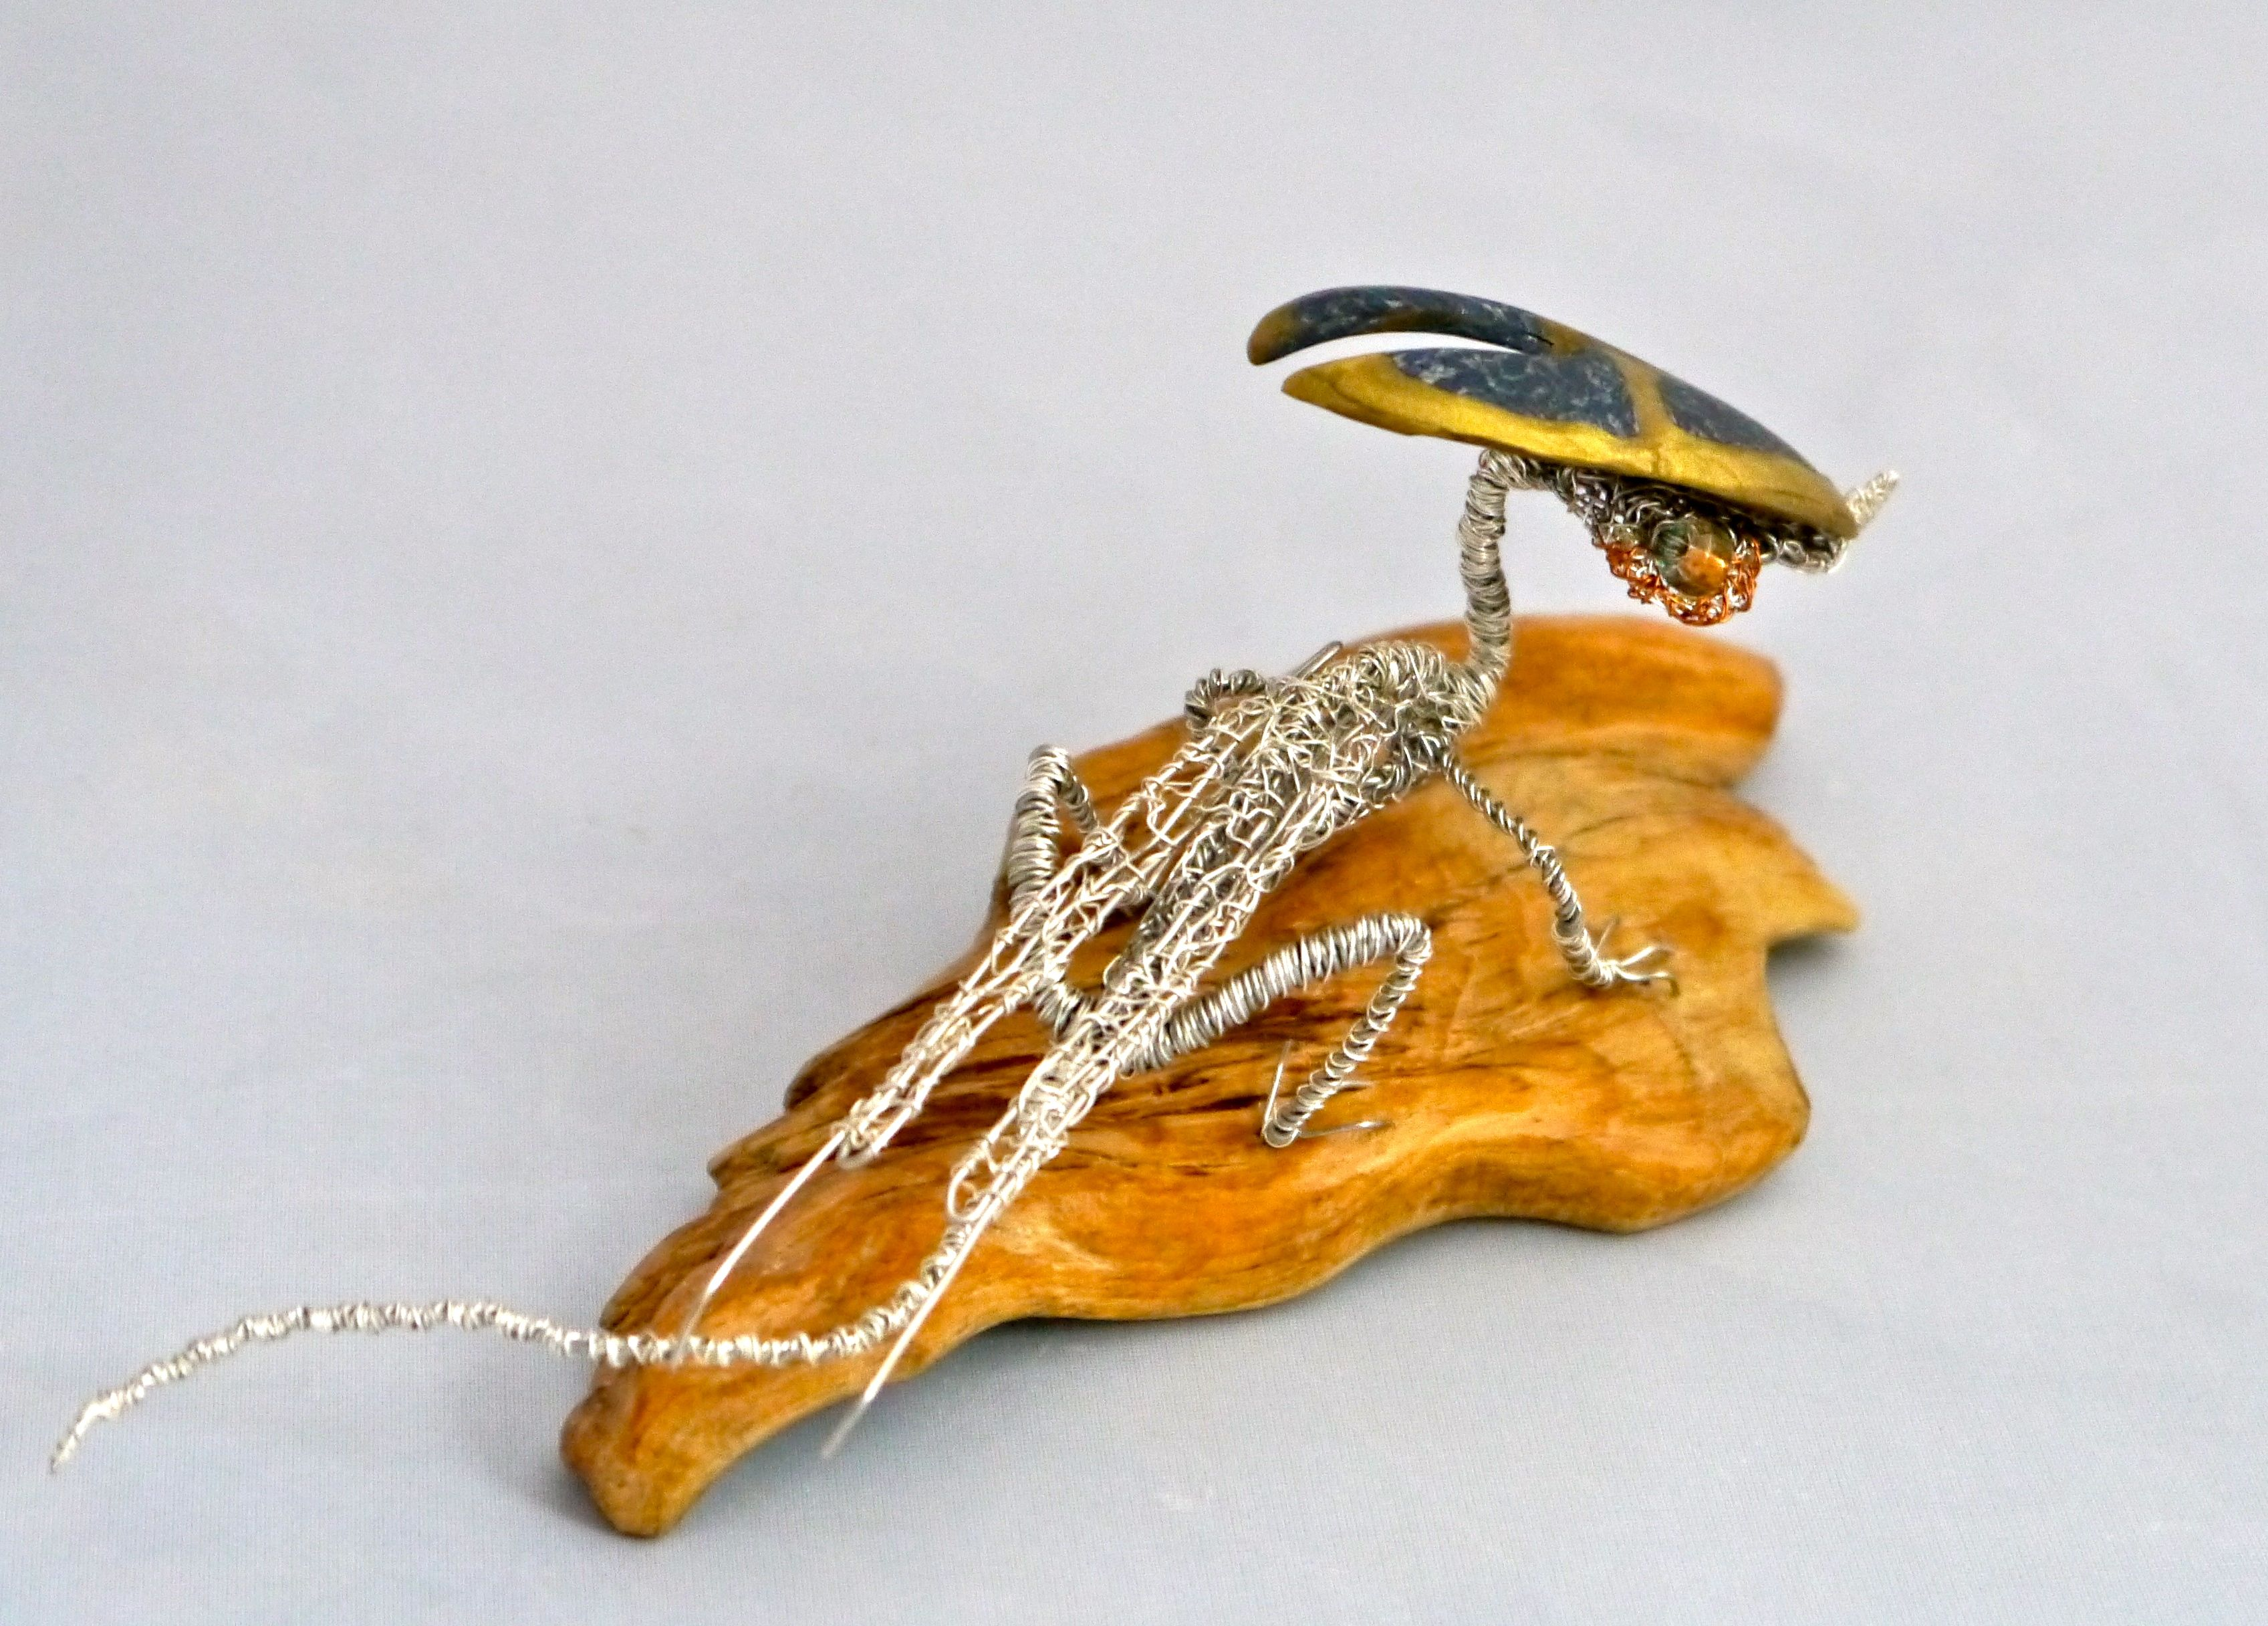 Gecko Dragon wire sculpture by Matthew Gale www.facebook.com/MatthewGaleArt